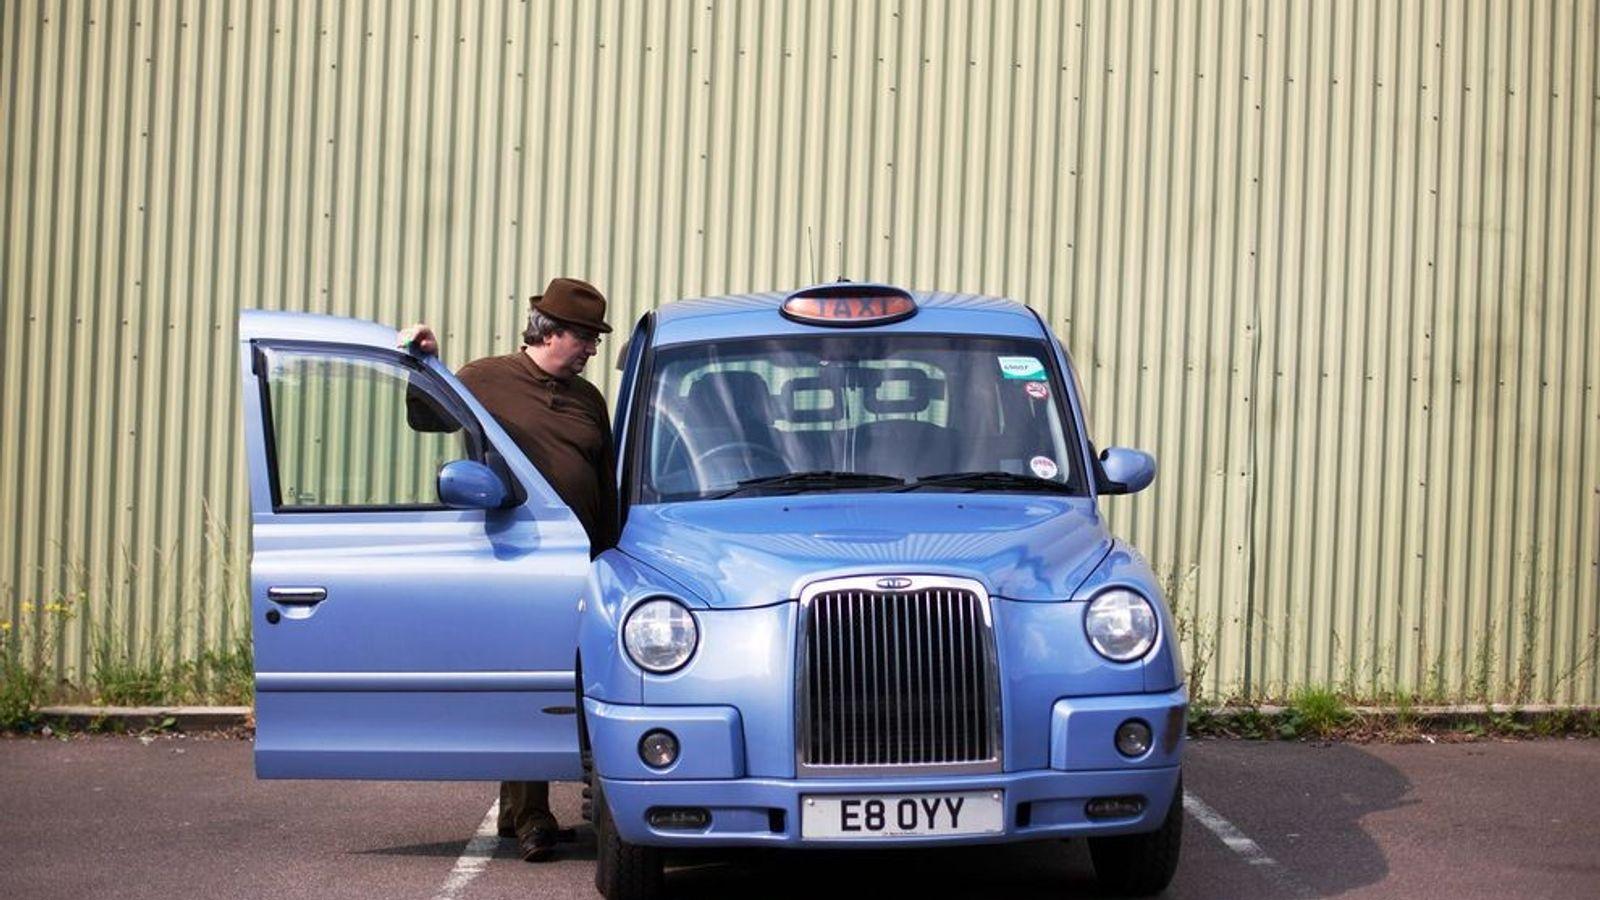 Veteran cabbie Ian Gordon alights from his cab at the KK Knowledge School to teach a ...